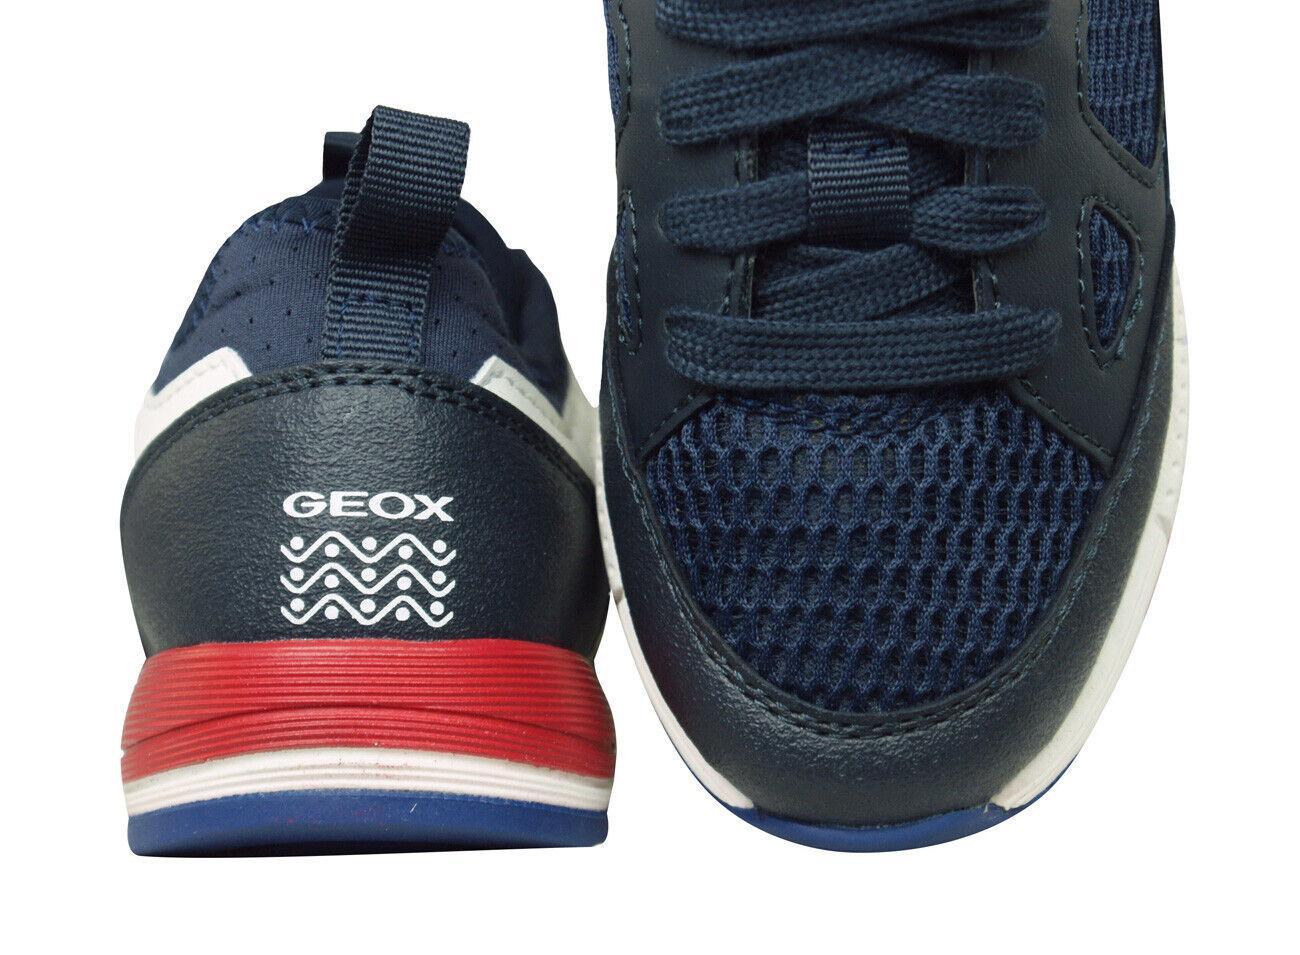 Salomon XA Pro J Kinderschuhe Burschen Halbschuhe Schnürer Sneaker Blau Sport Ju